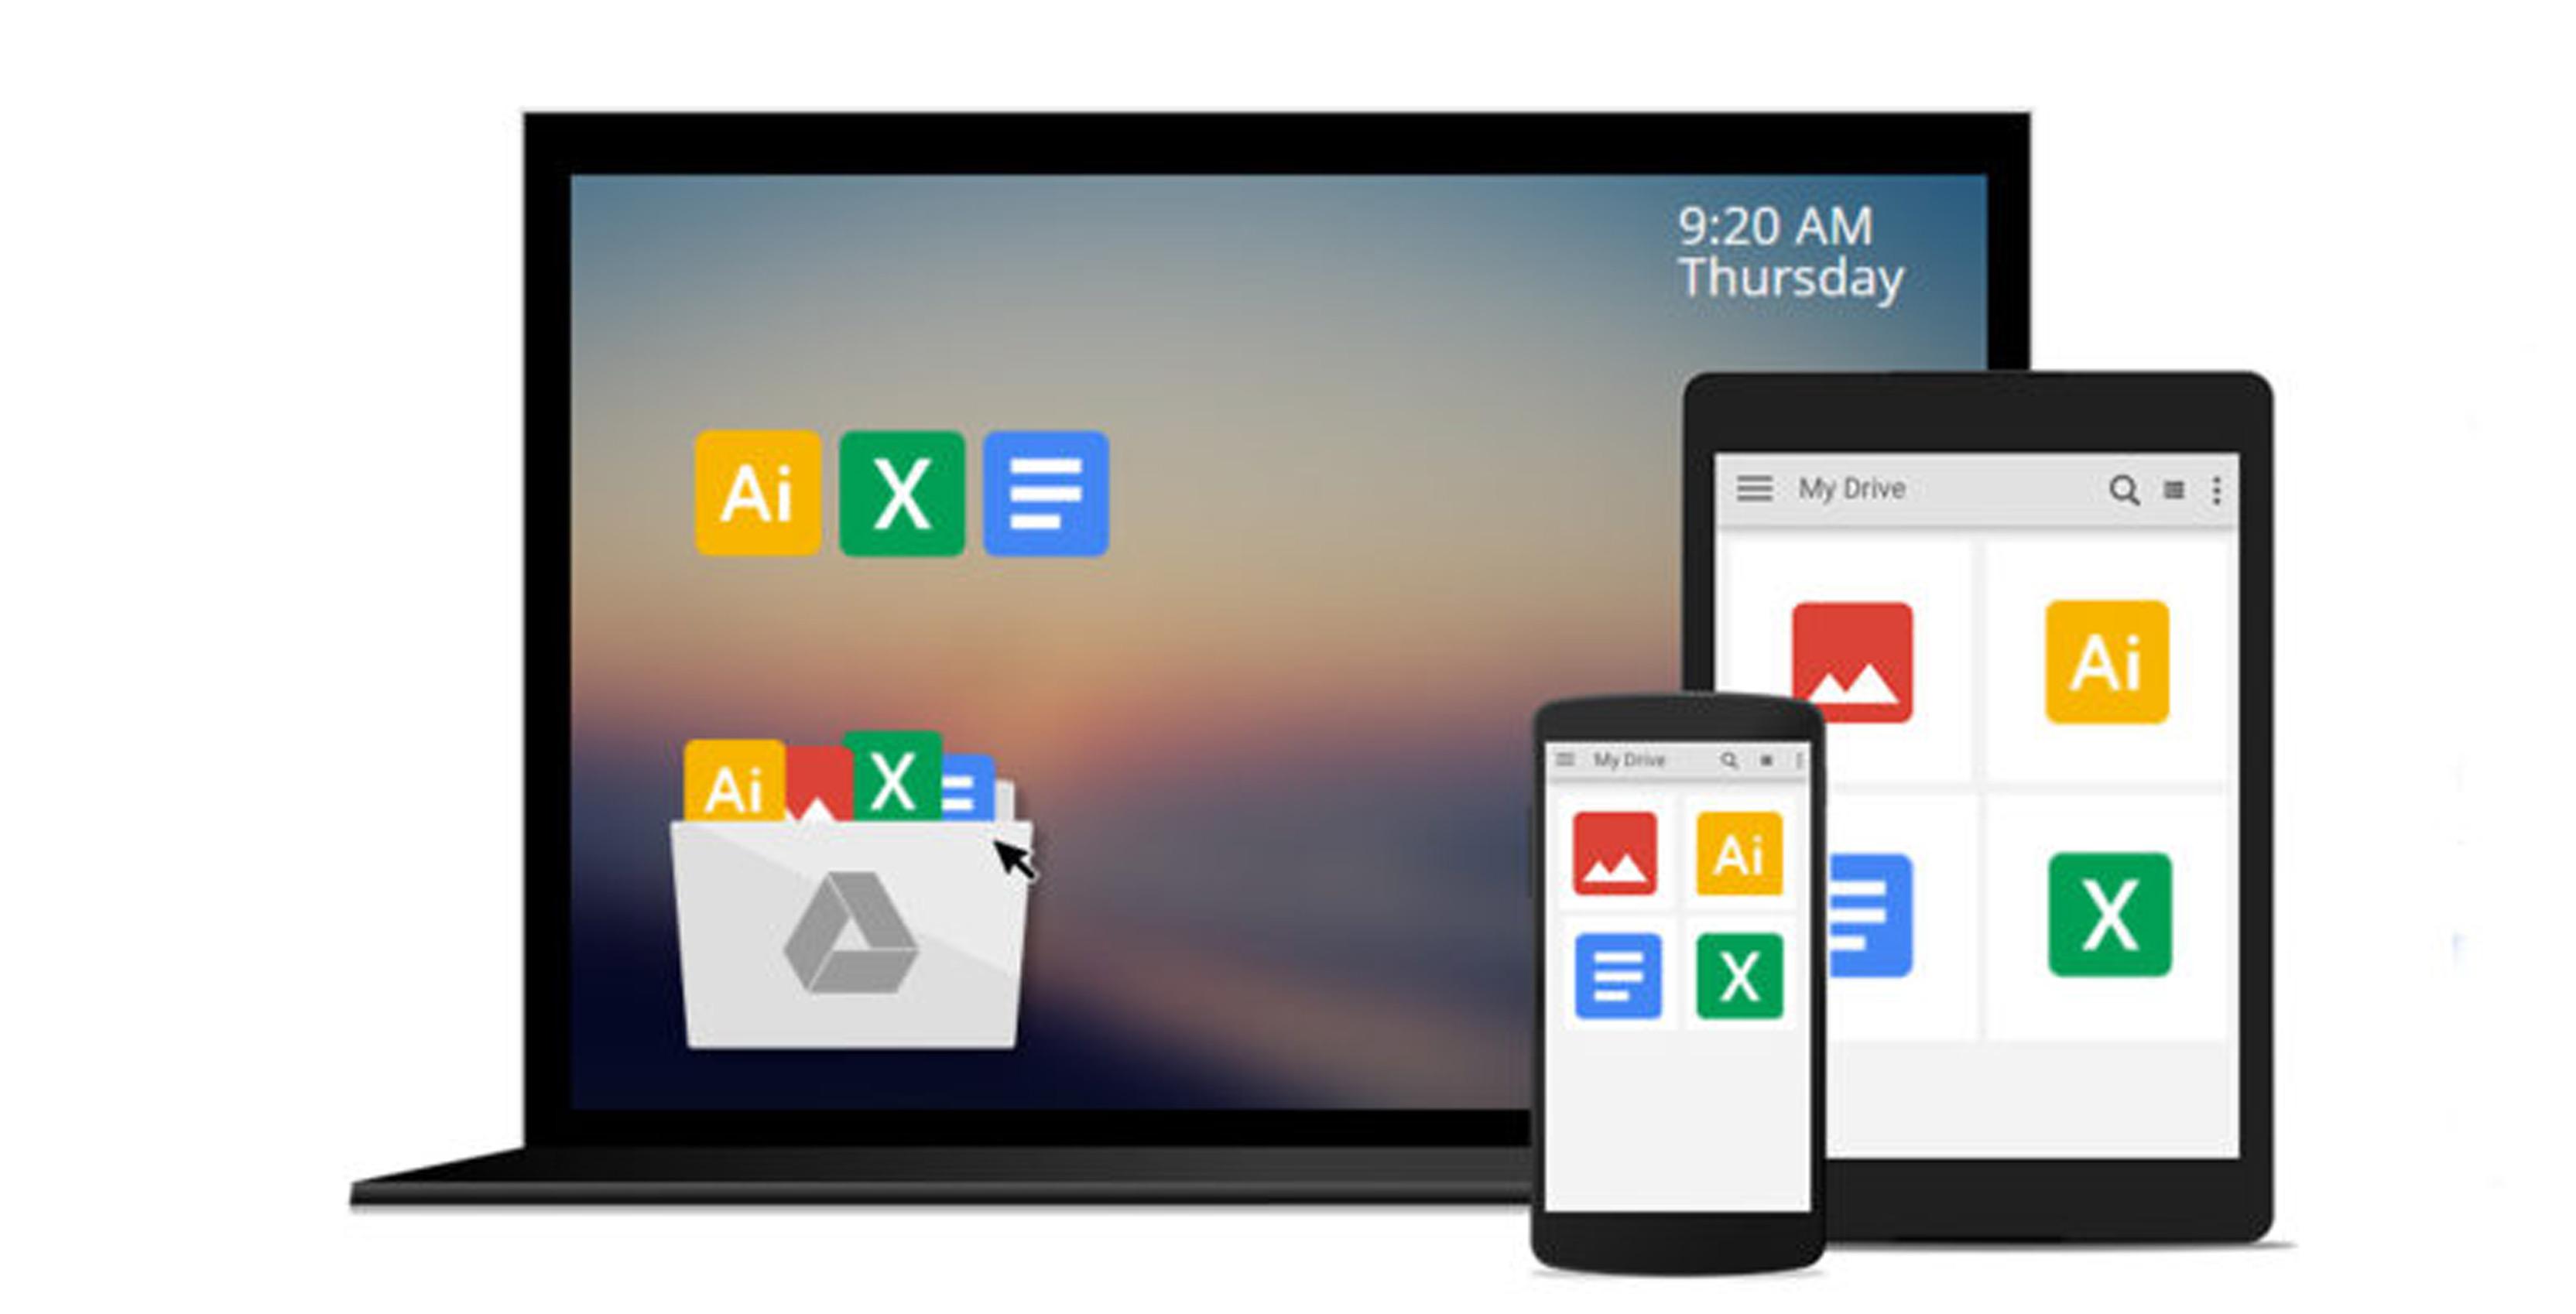 Google Backup and Sync app